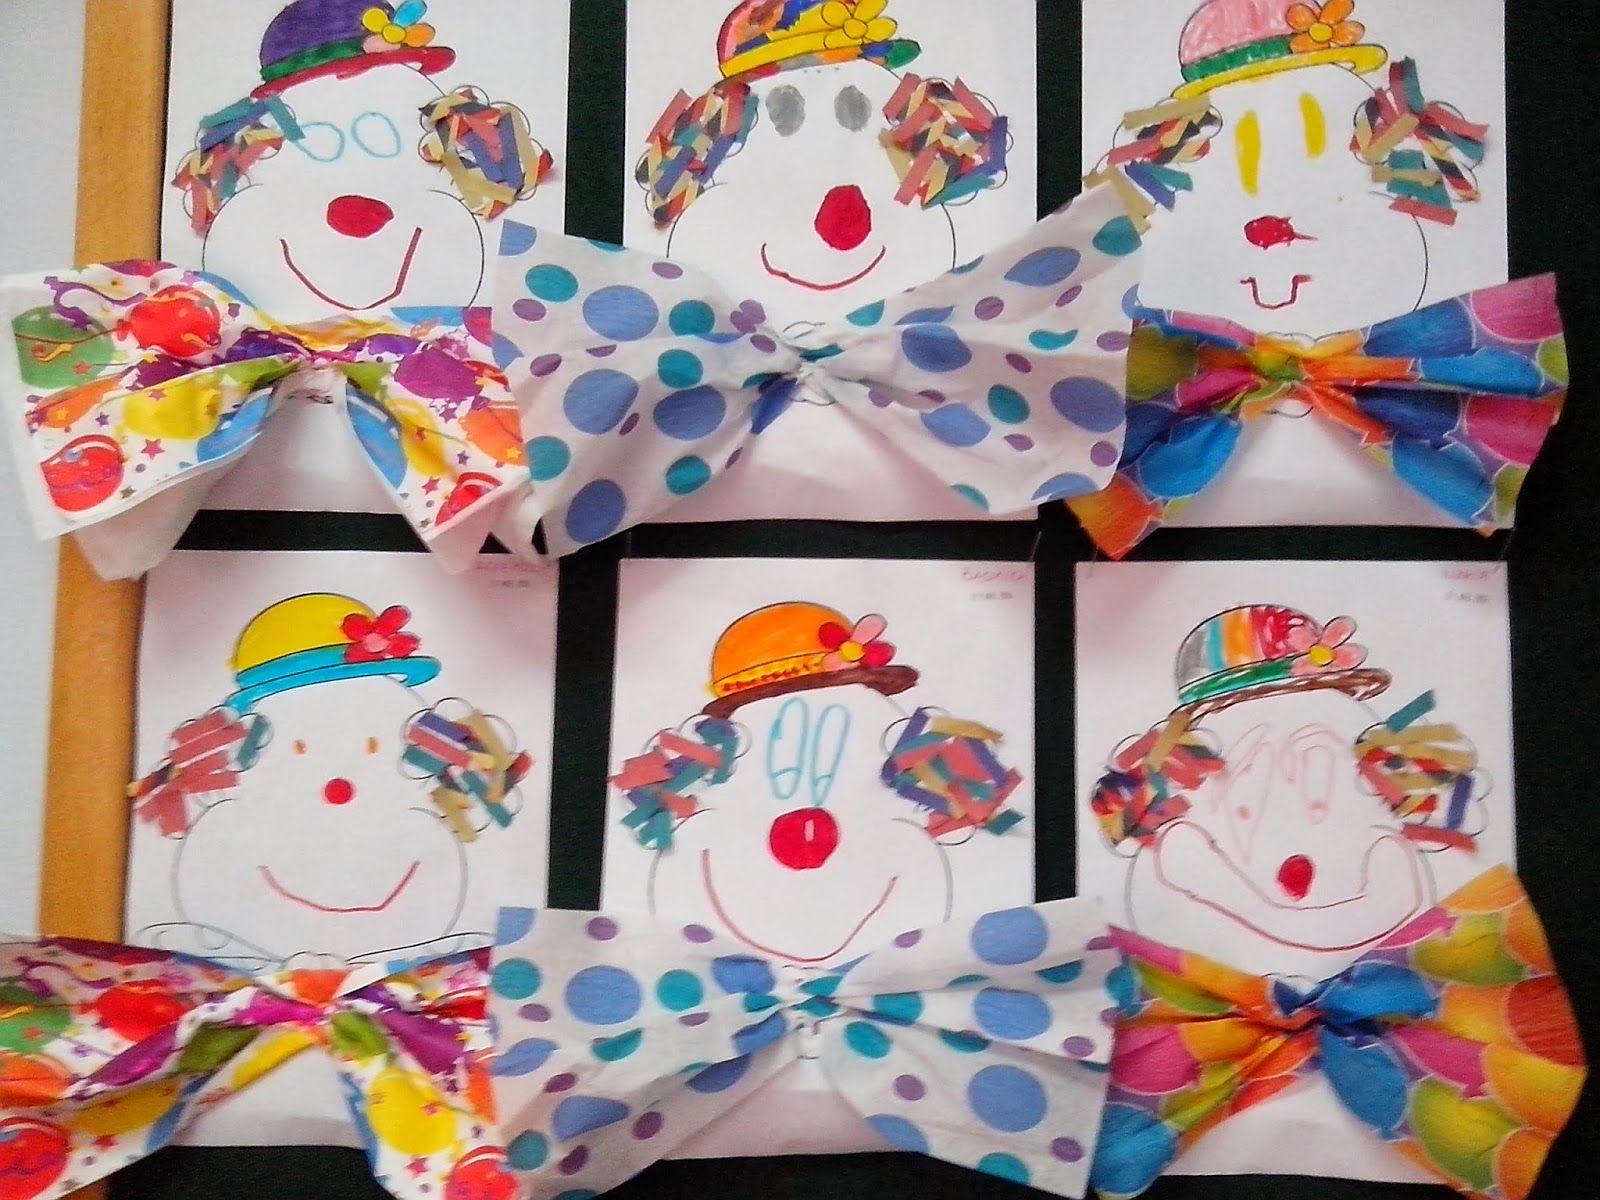 Maro 39 s kindergarten clown - Clown basteln kindergarten ...